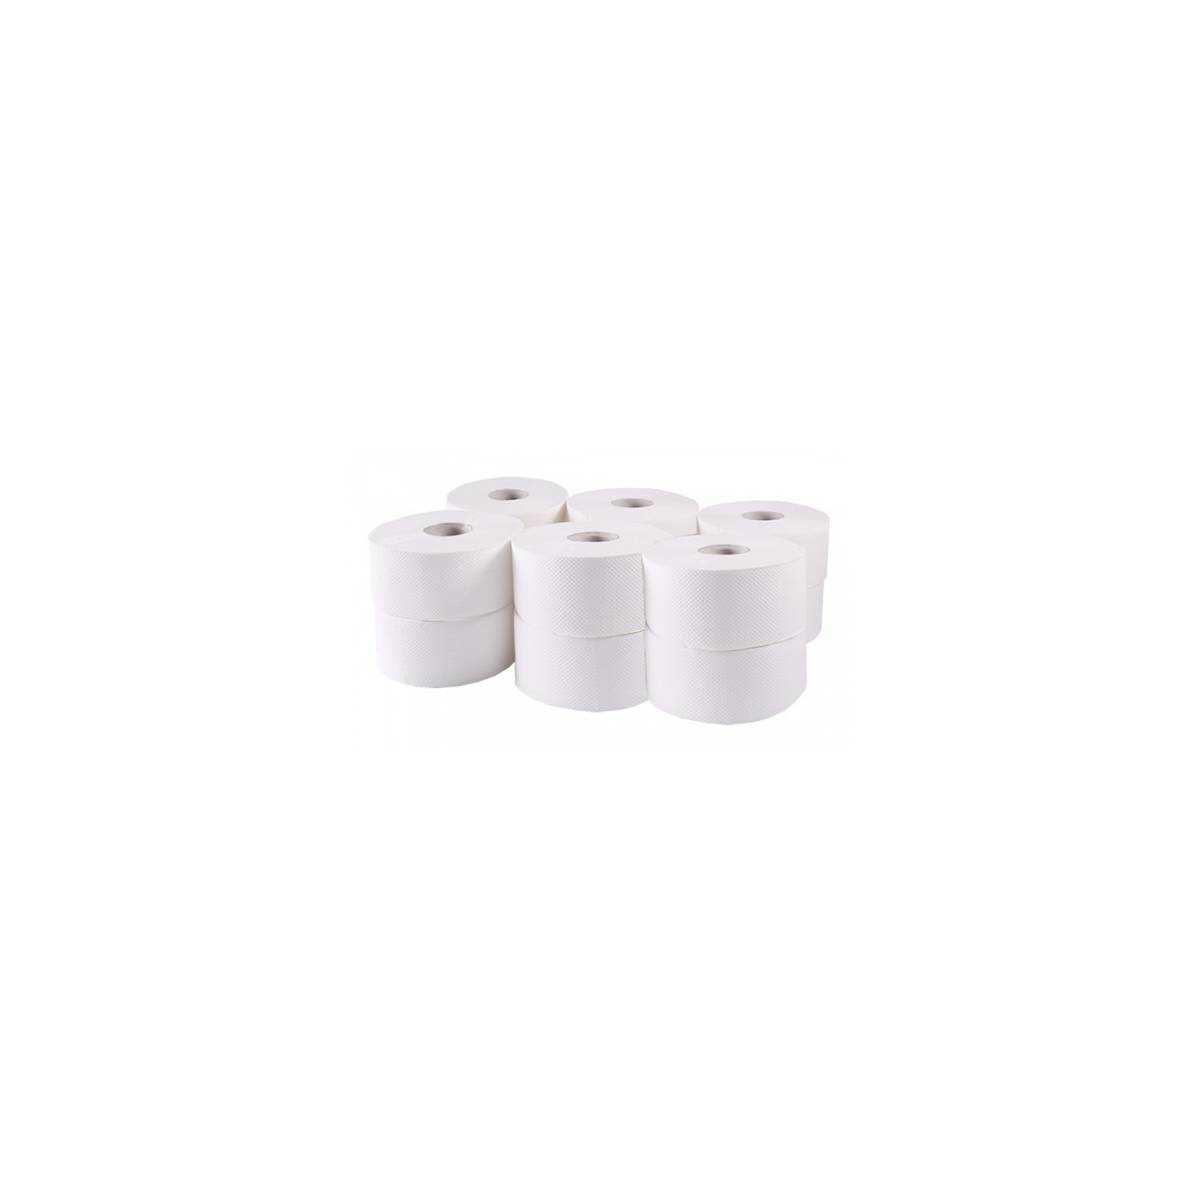 Туалетная бумага в рулоне JUMBO (B201S) 203020 Tischa Papier